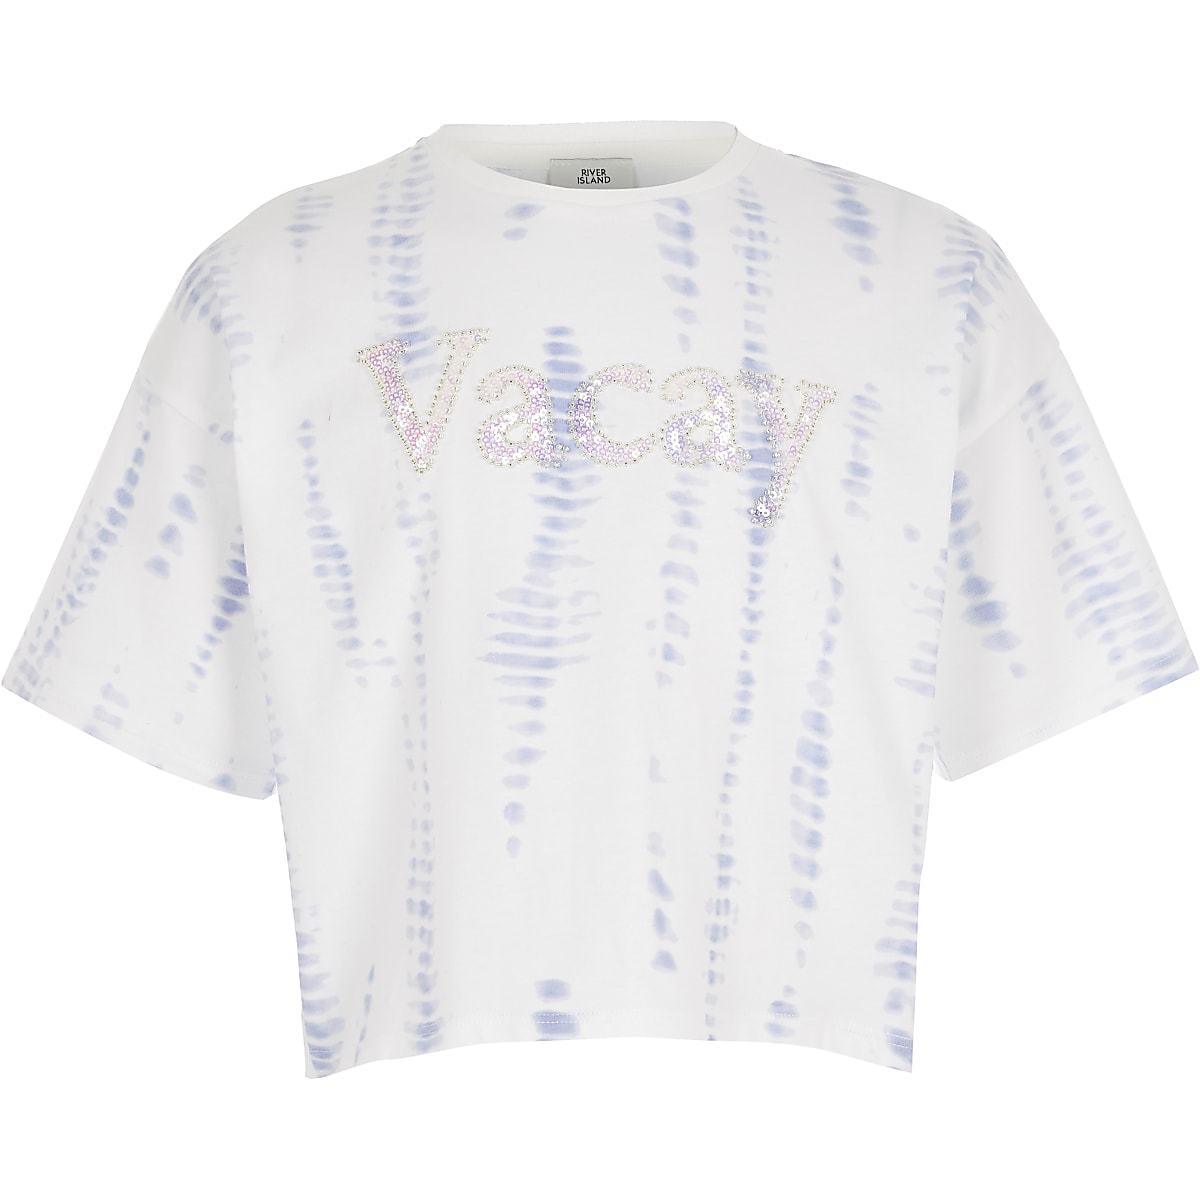 Girls white tie dye T-shirt